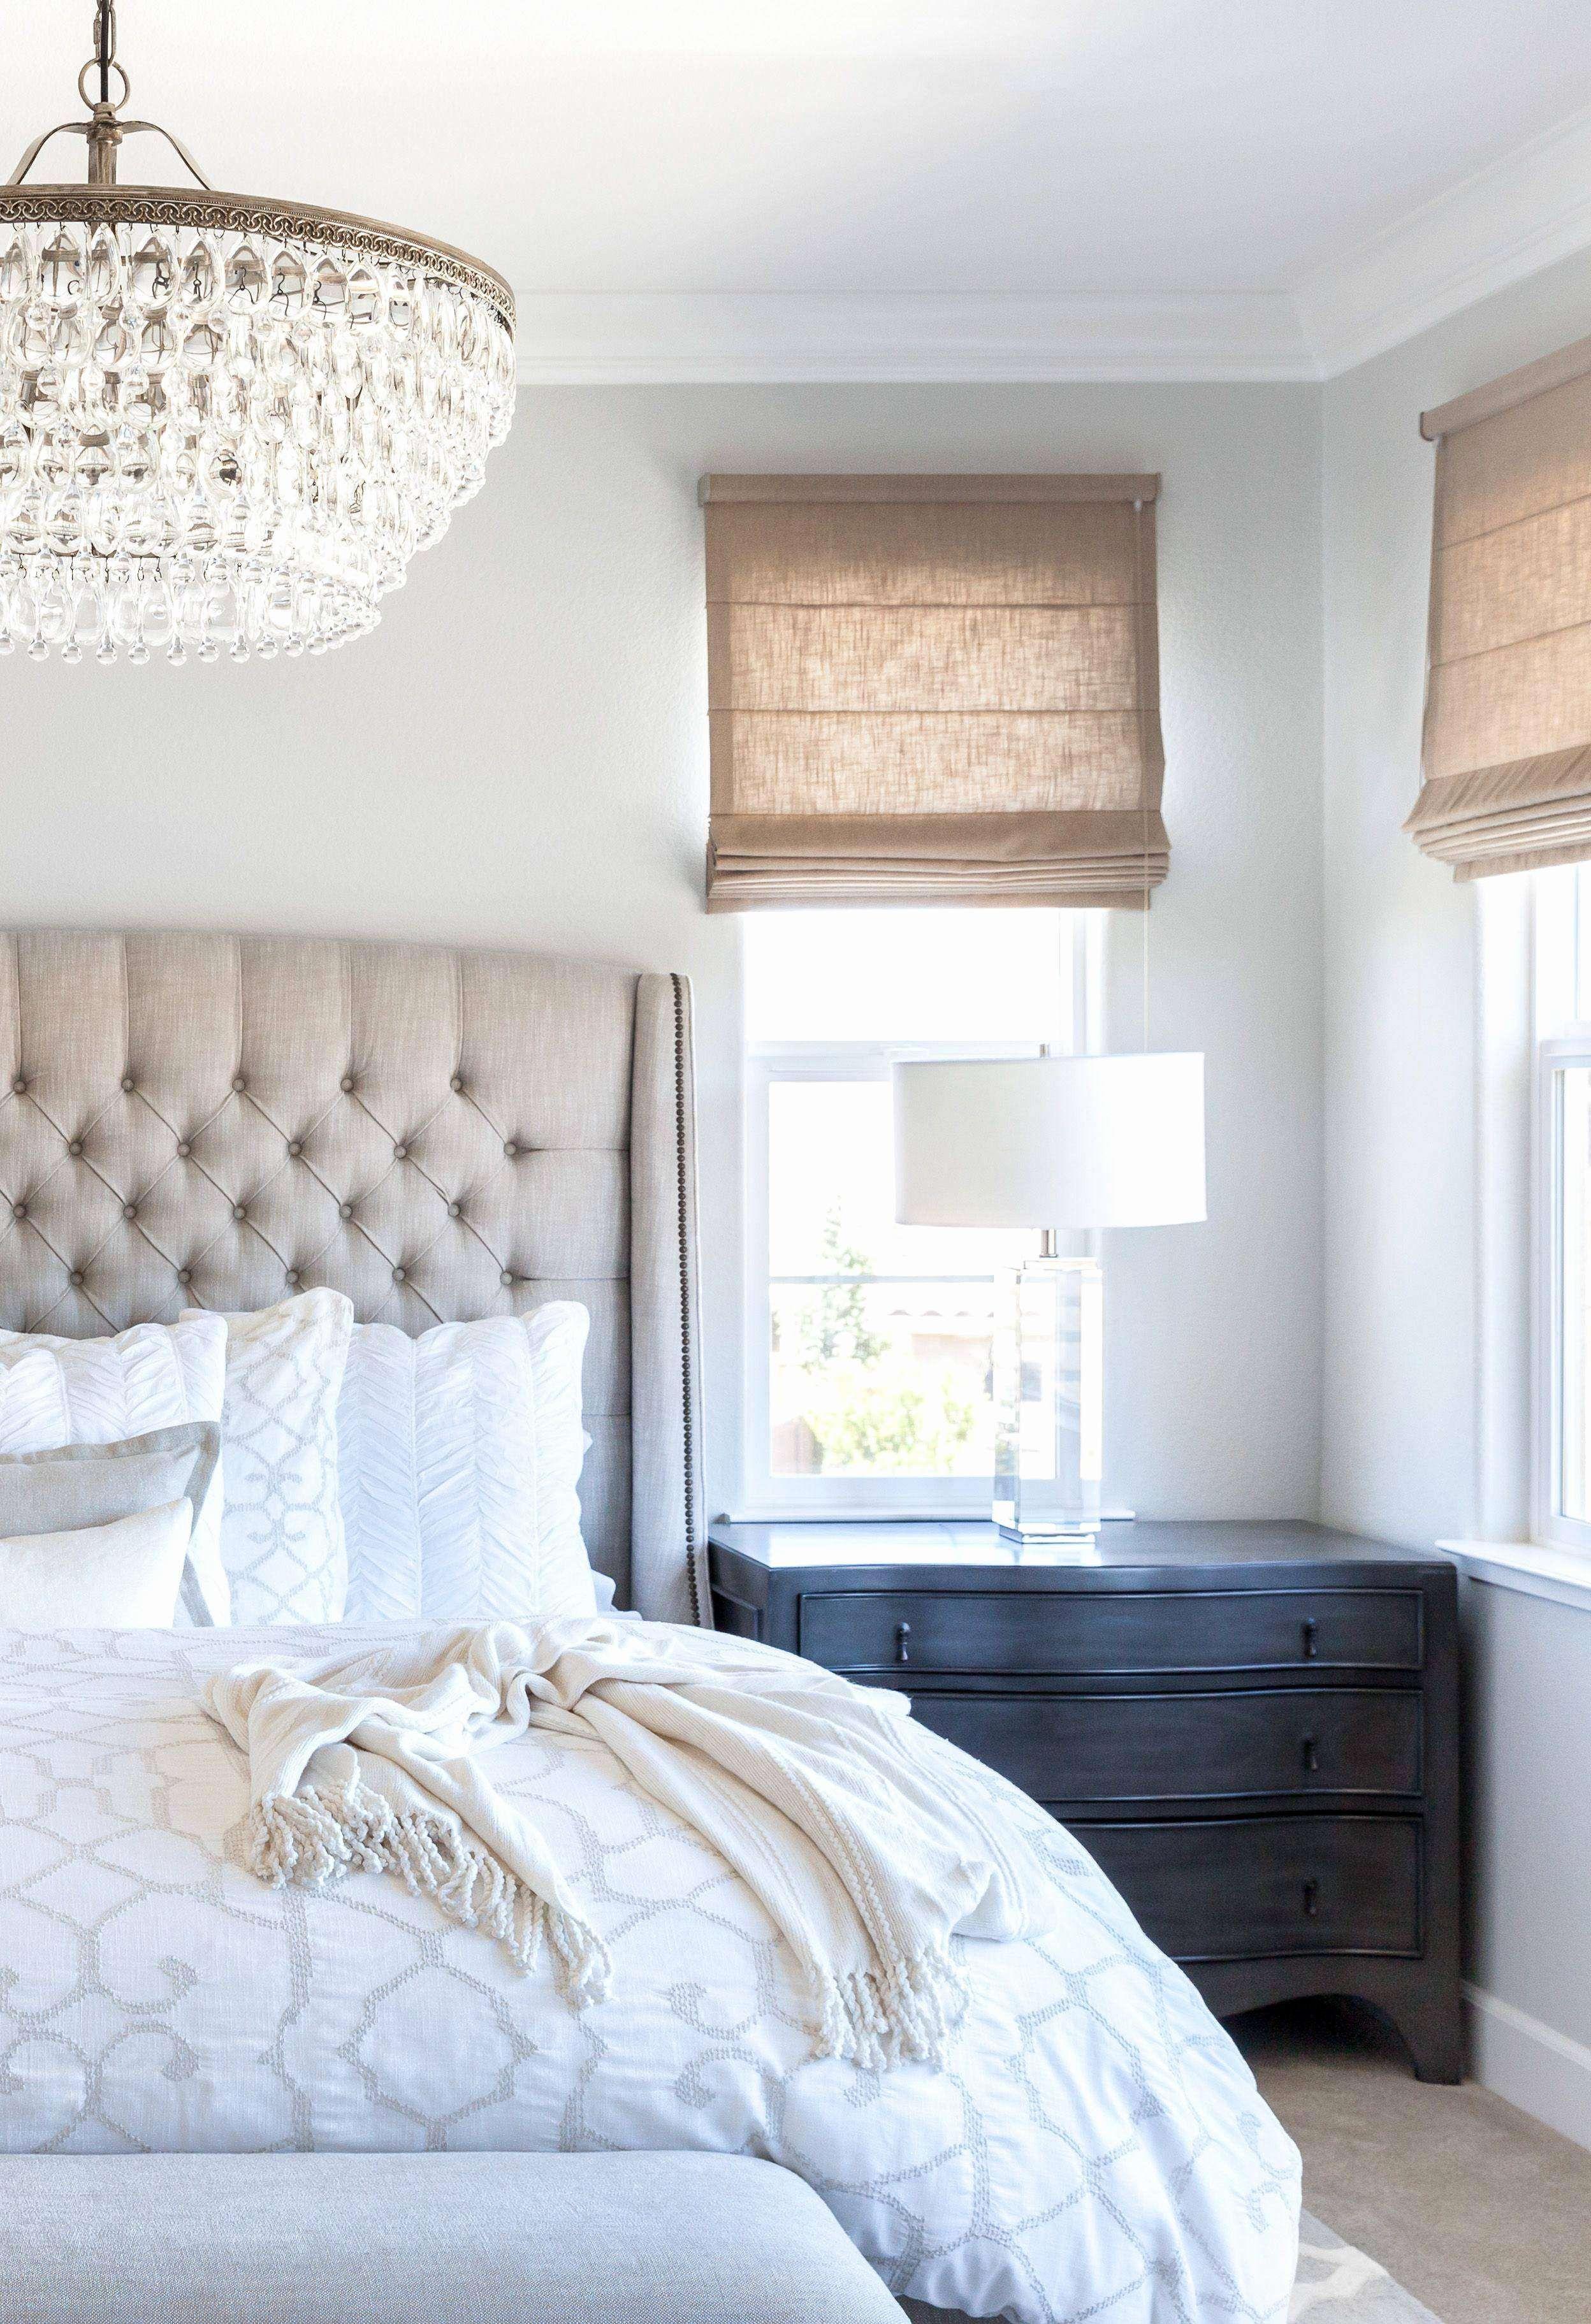 Sleek Bedroom Images  June, 2018